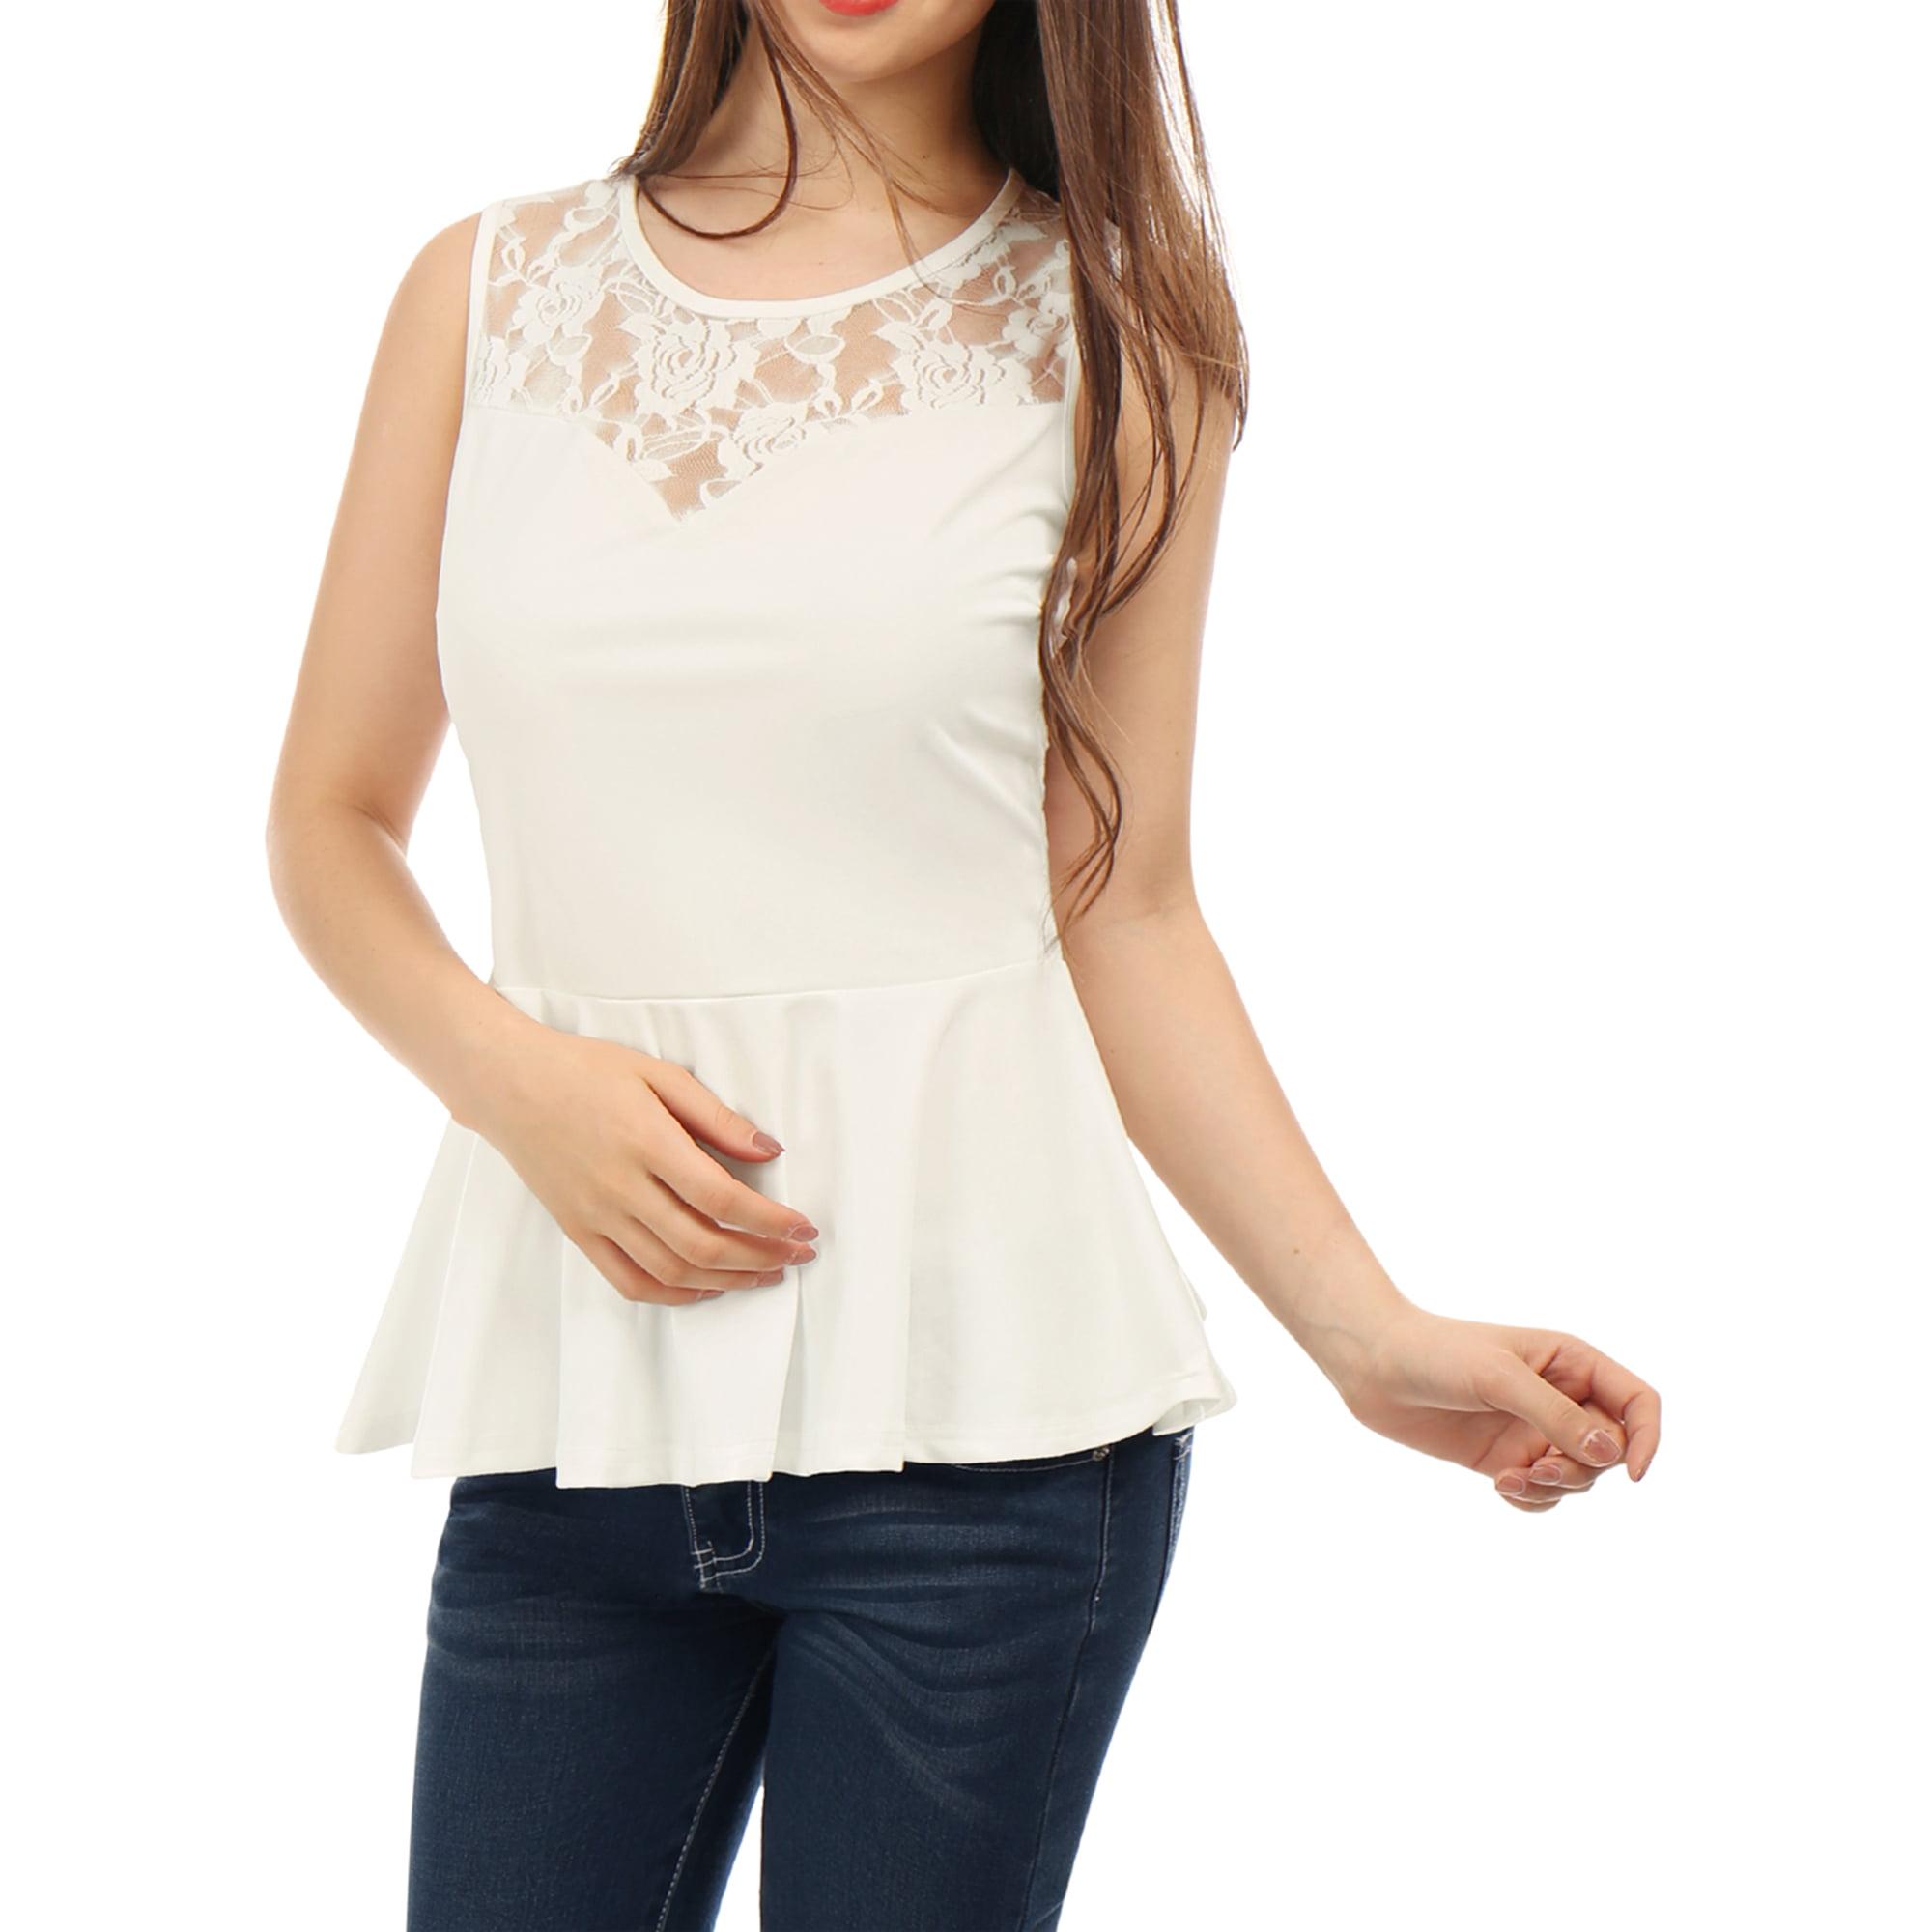 ca4dfa2ac8a7f Allegra K Lady Round Neck Sleeveless Lace Peplum Tops White L ...